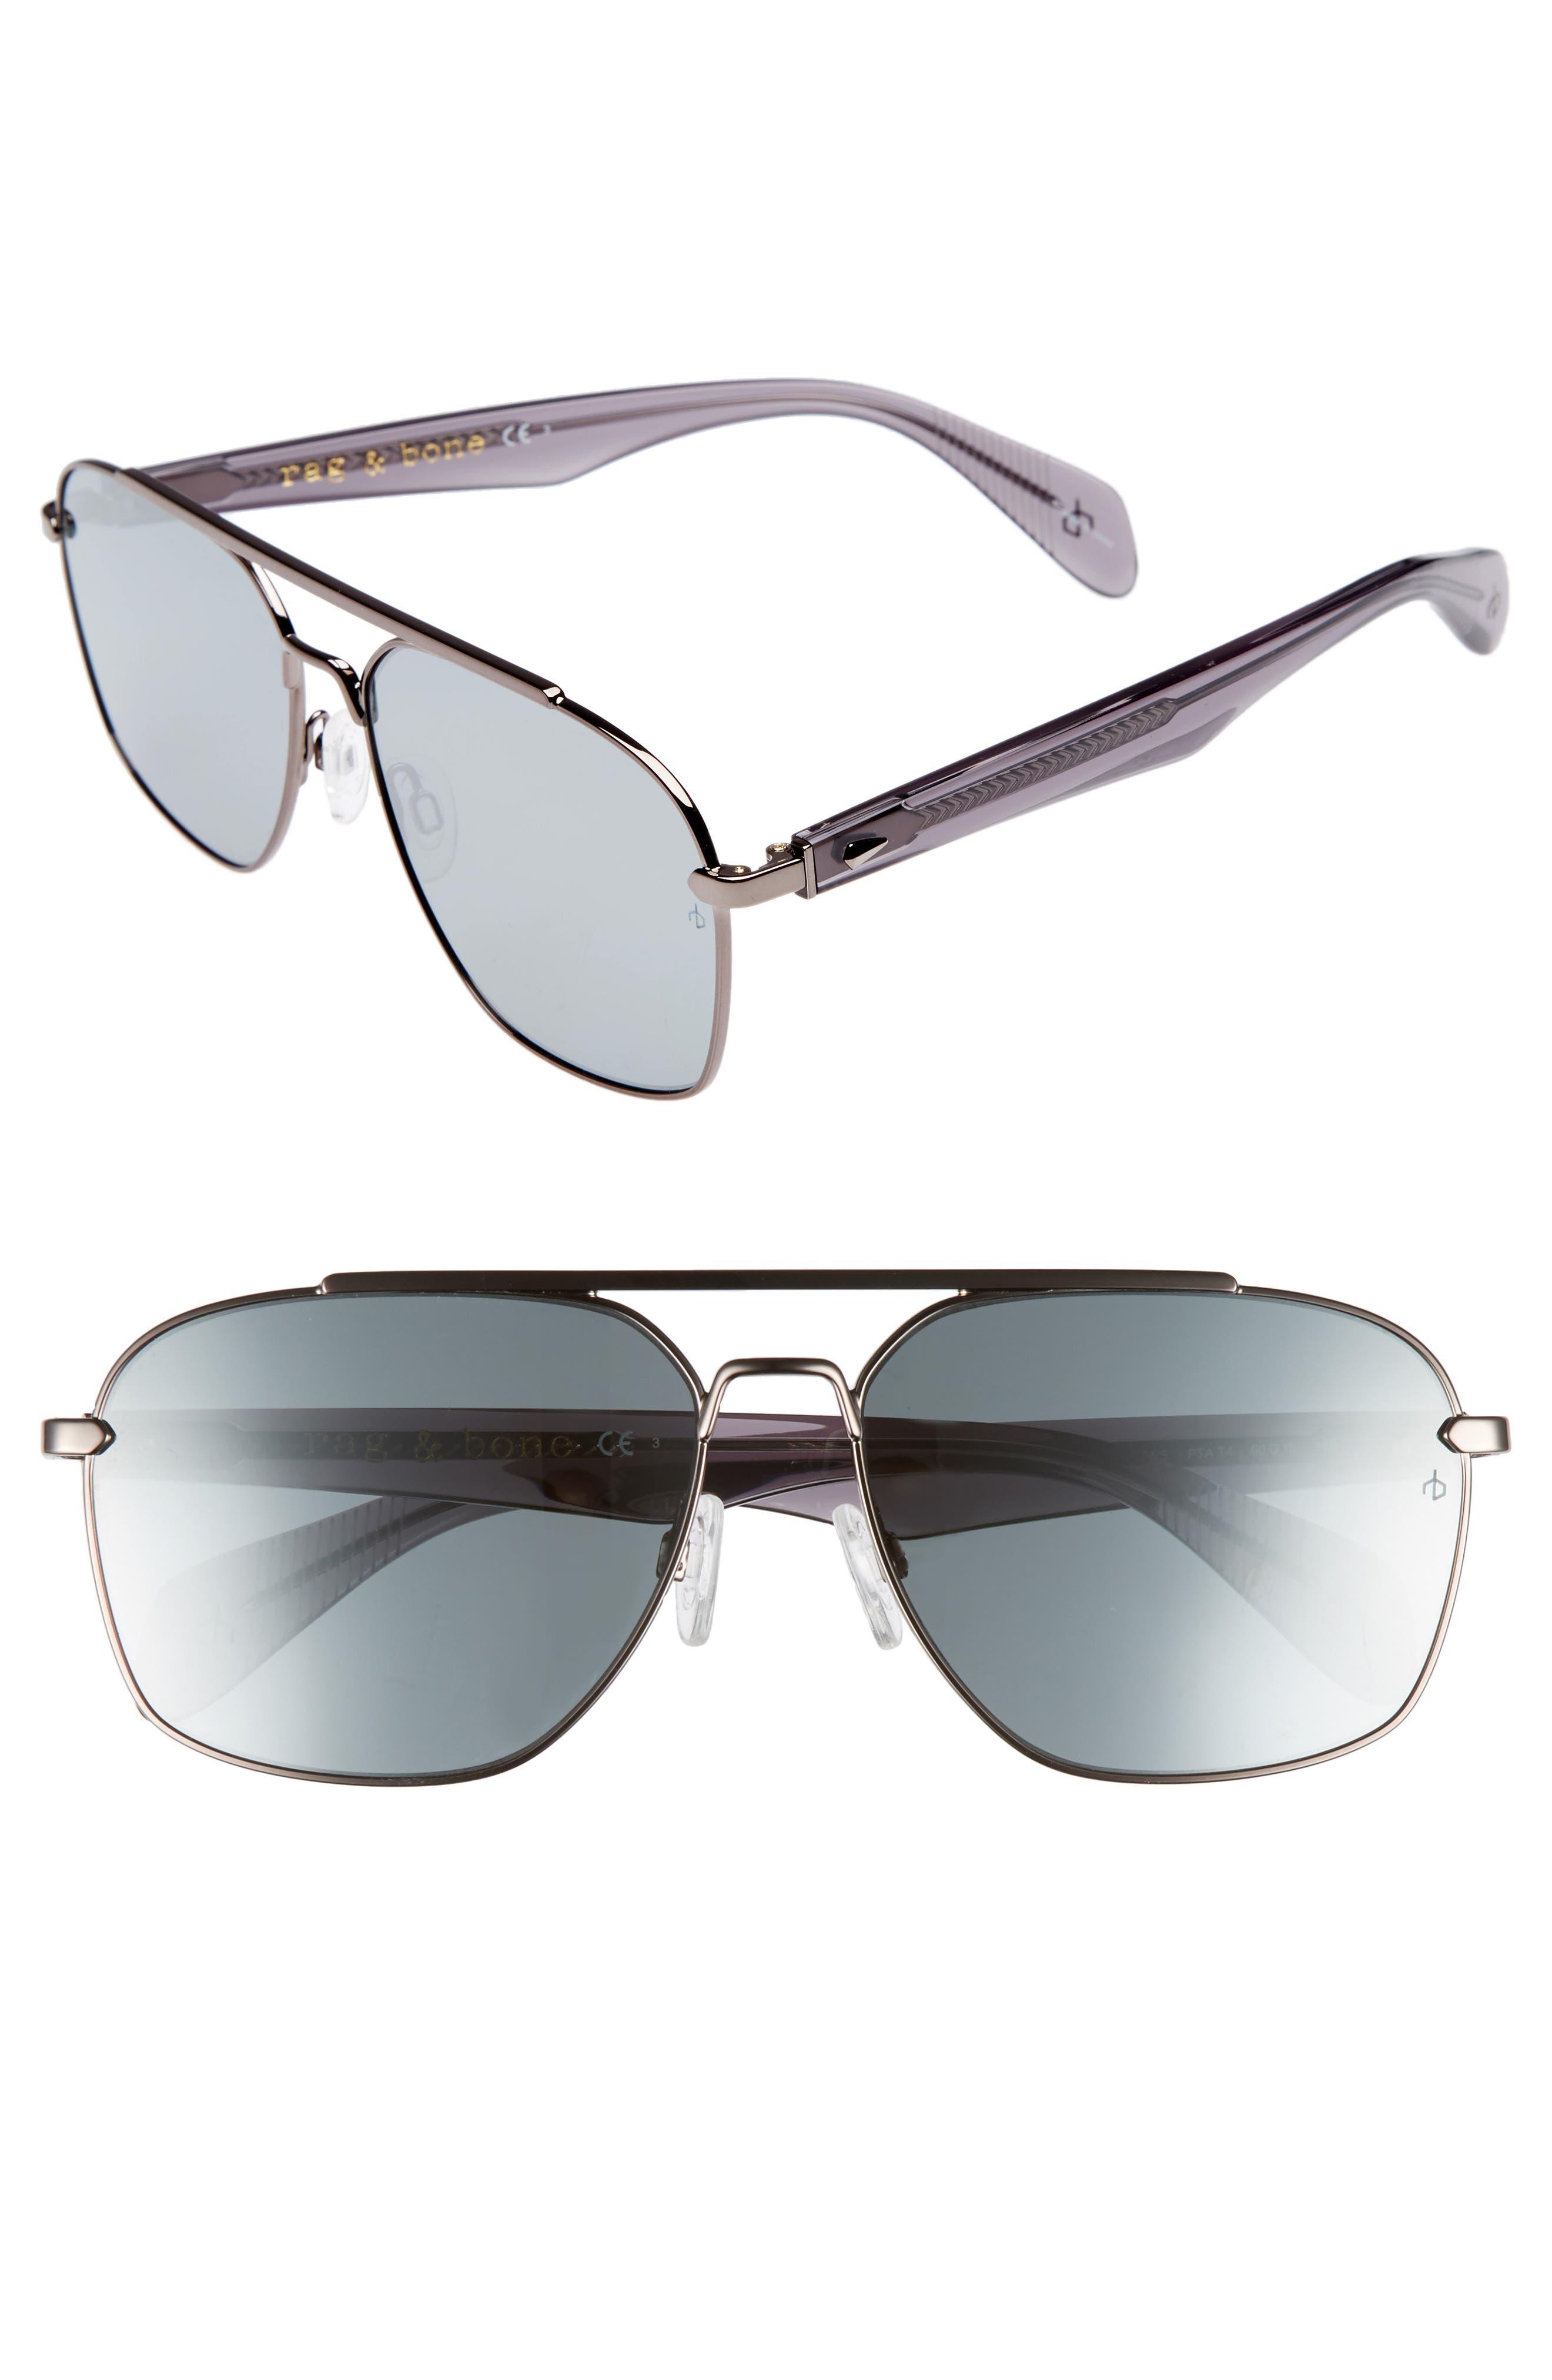 60mm Mirrored Navigator Sunglasses,                         Main,                         color, Matte Ruthenium/ Grey